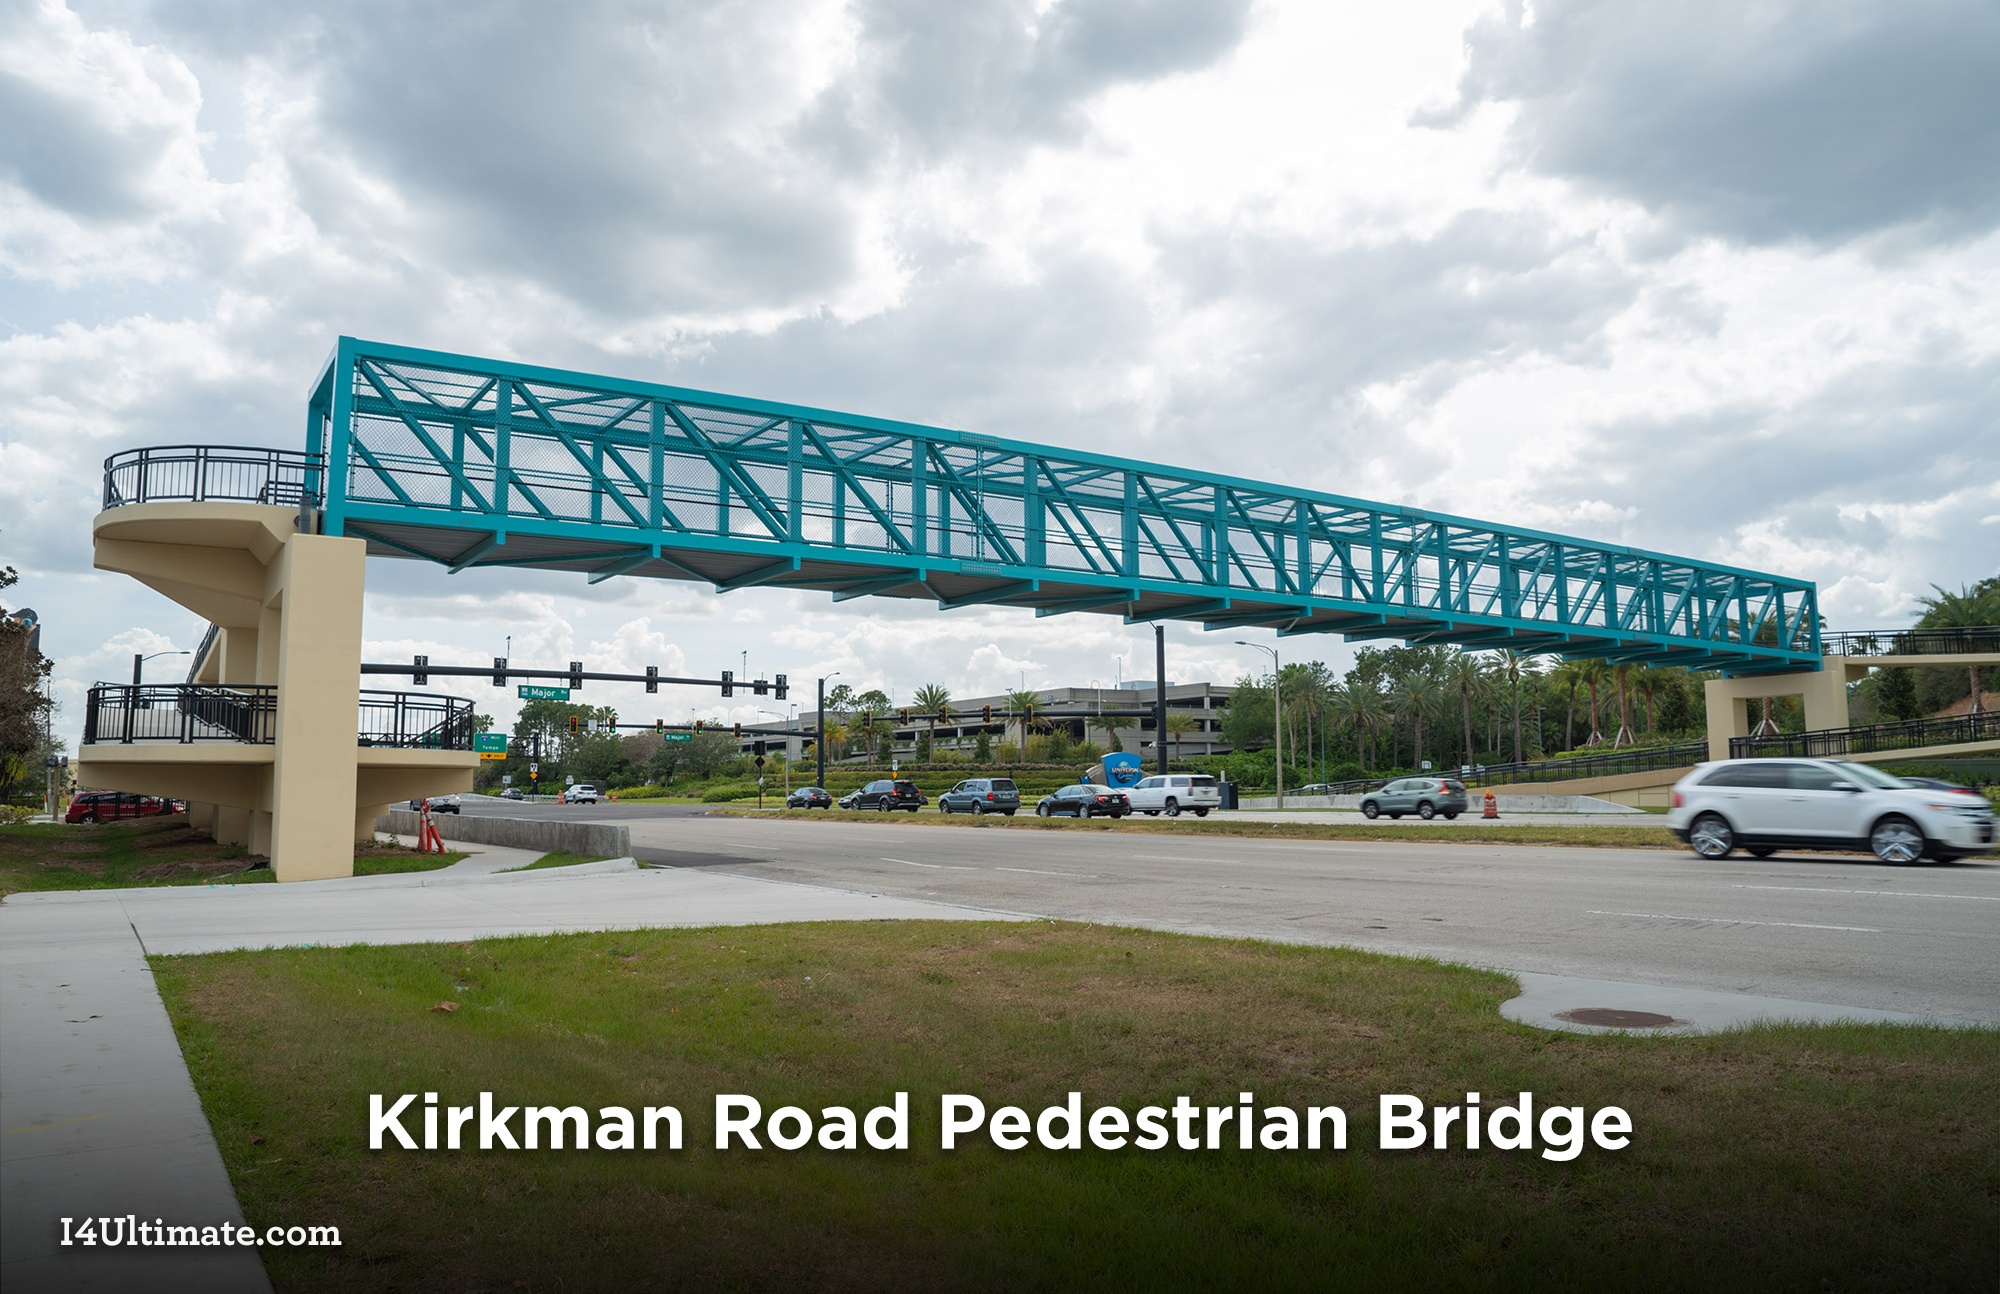 Kirkman-Road-Pedestrian-Bridge-2020